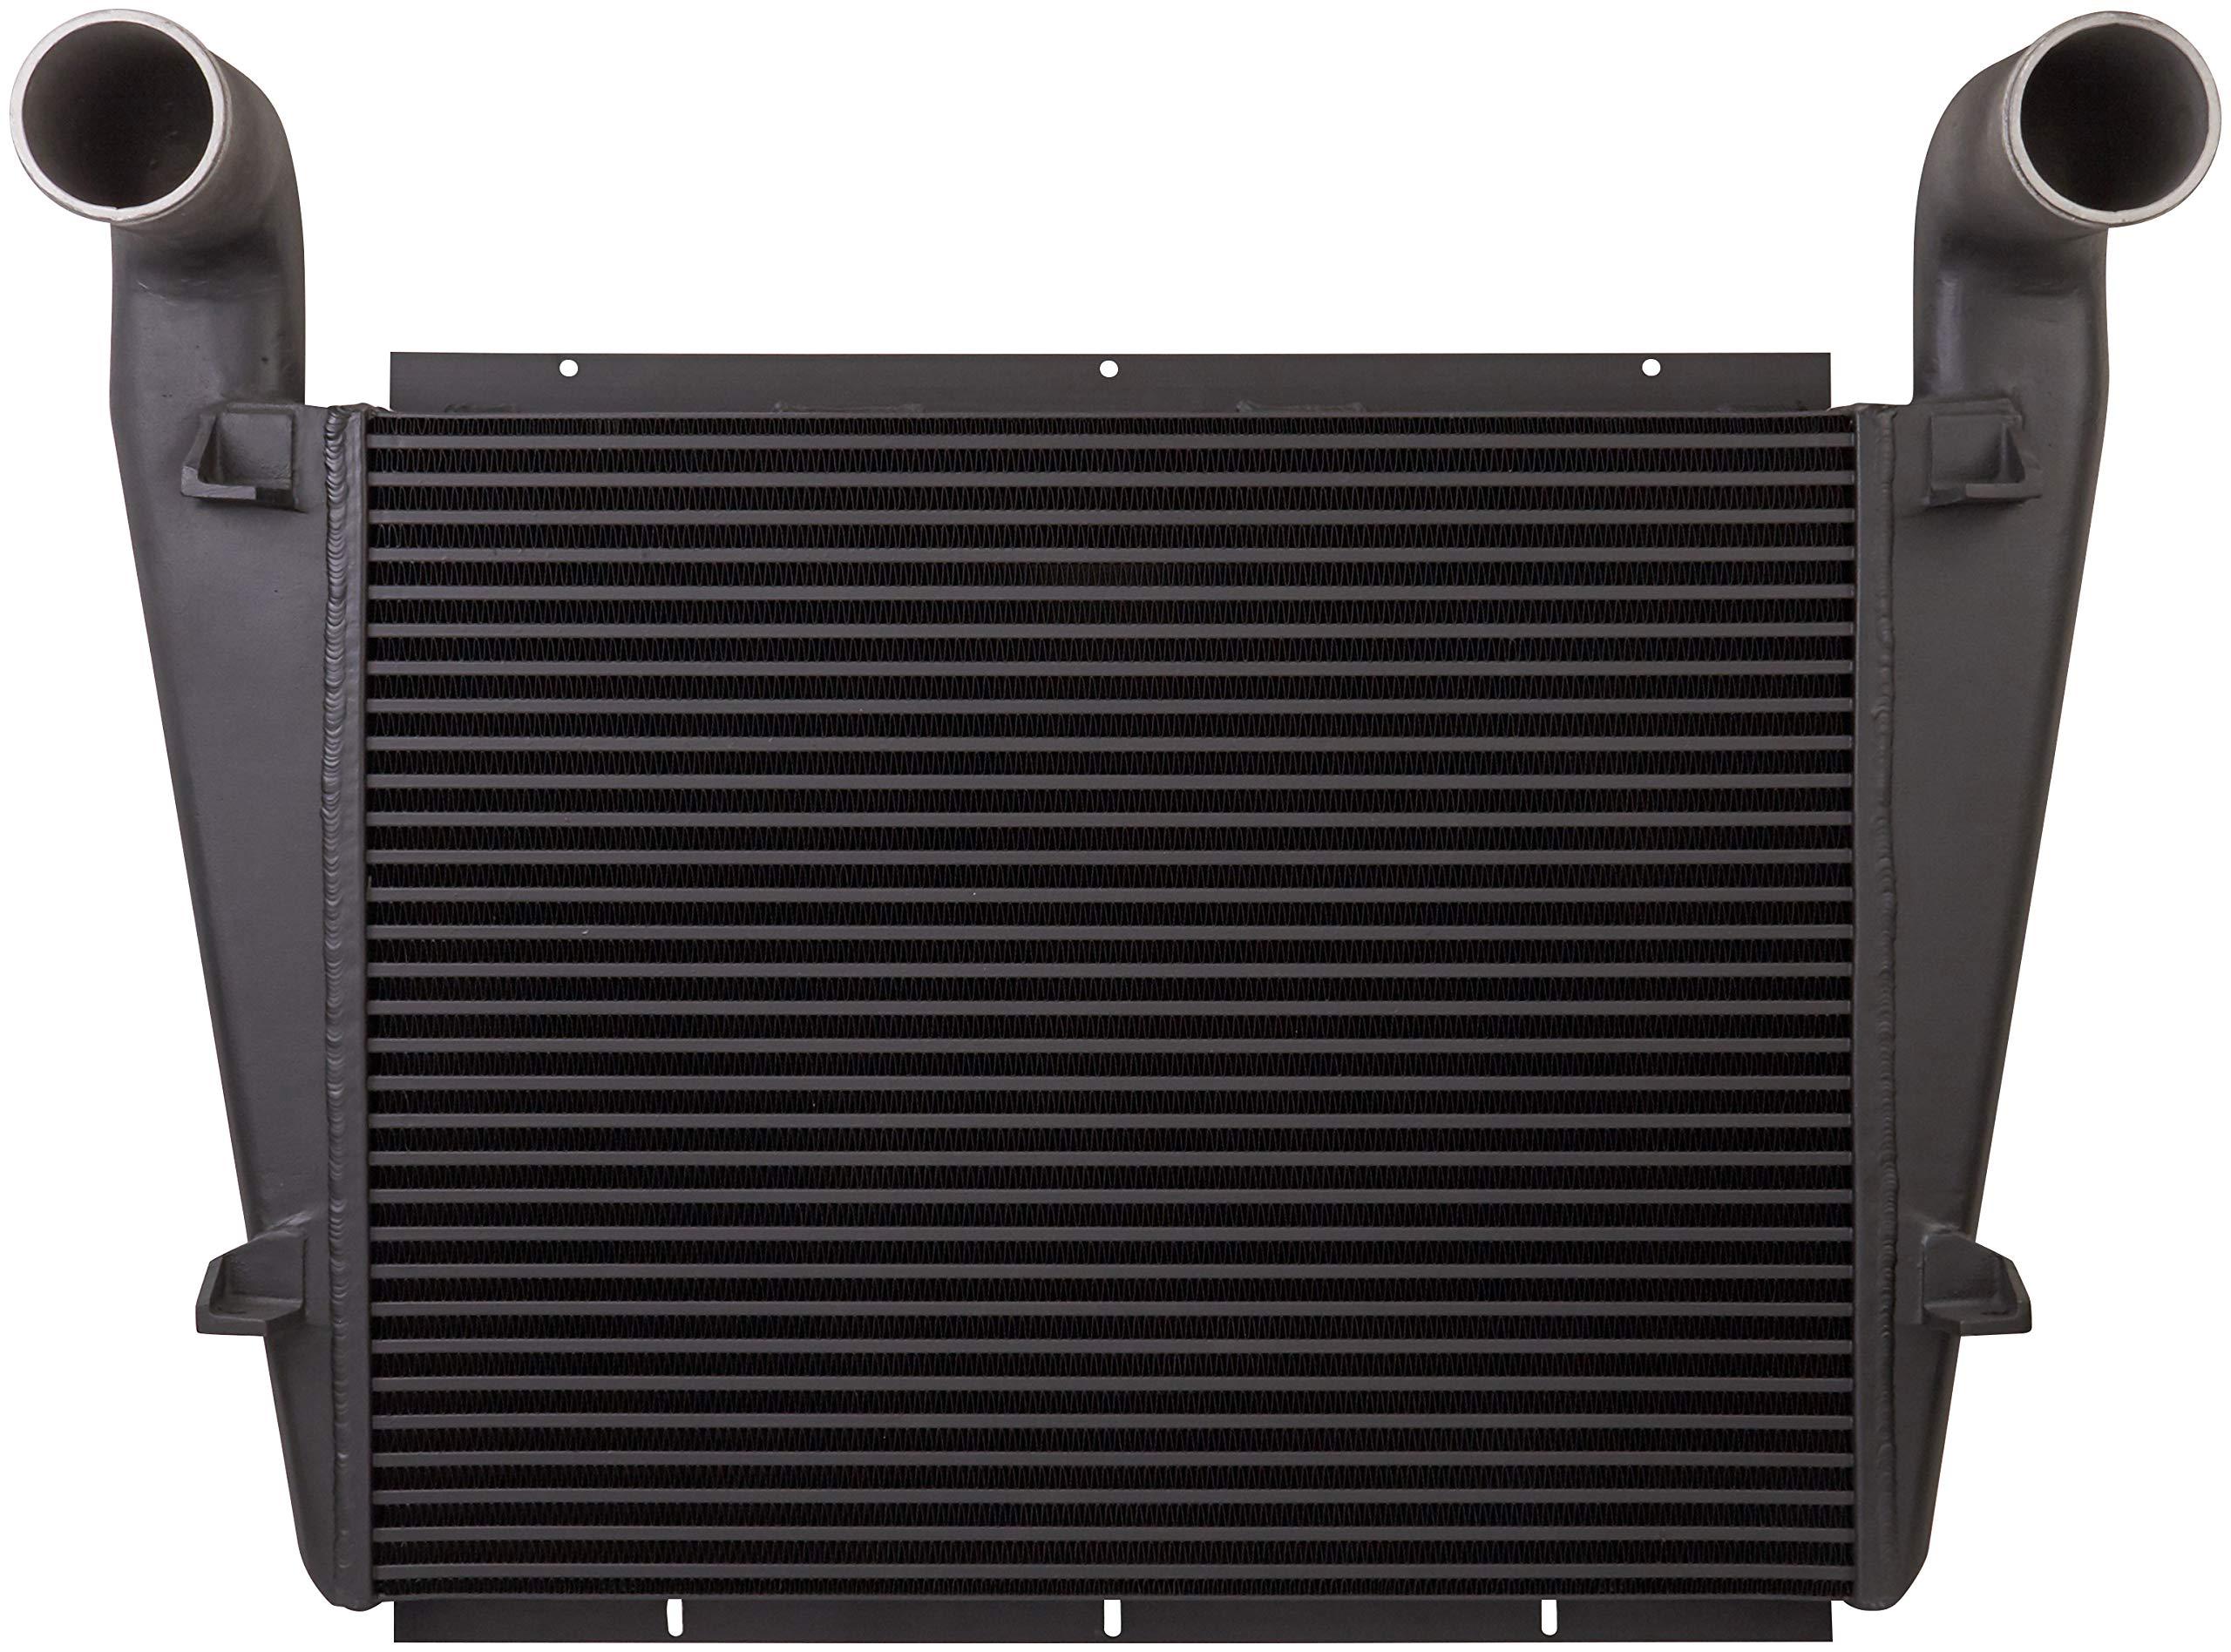 Spectra Premium 4401-3002 Turbocharger Intercooler